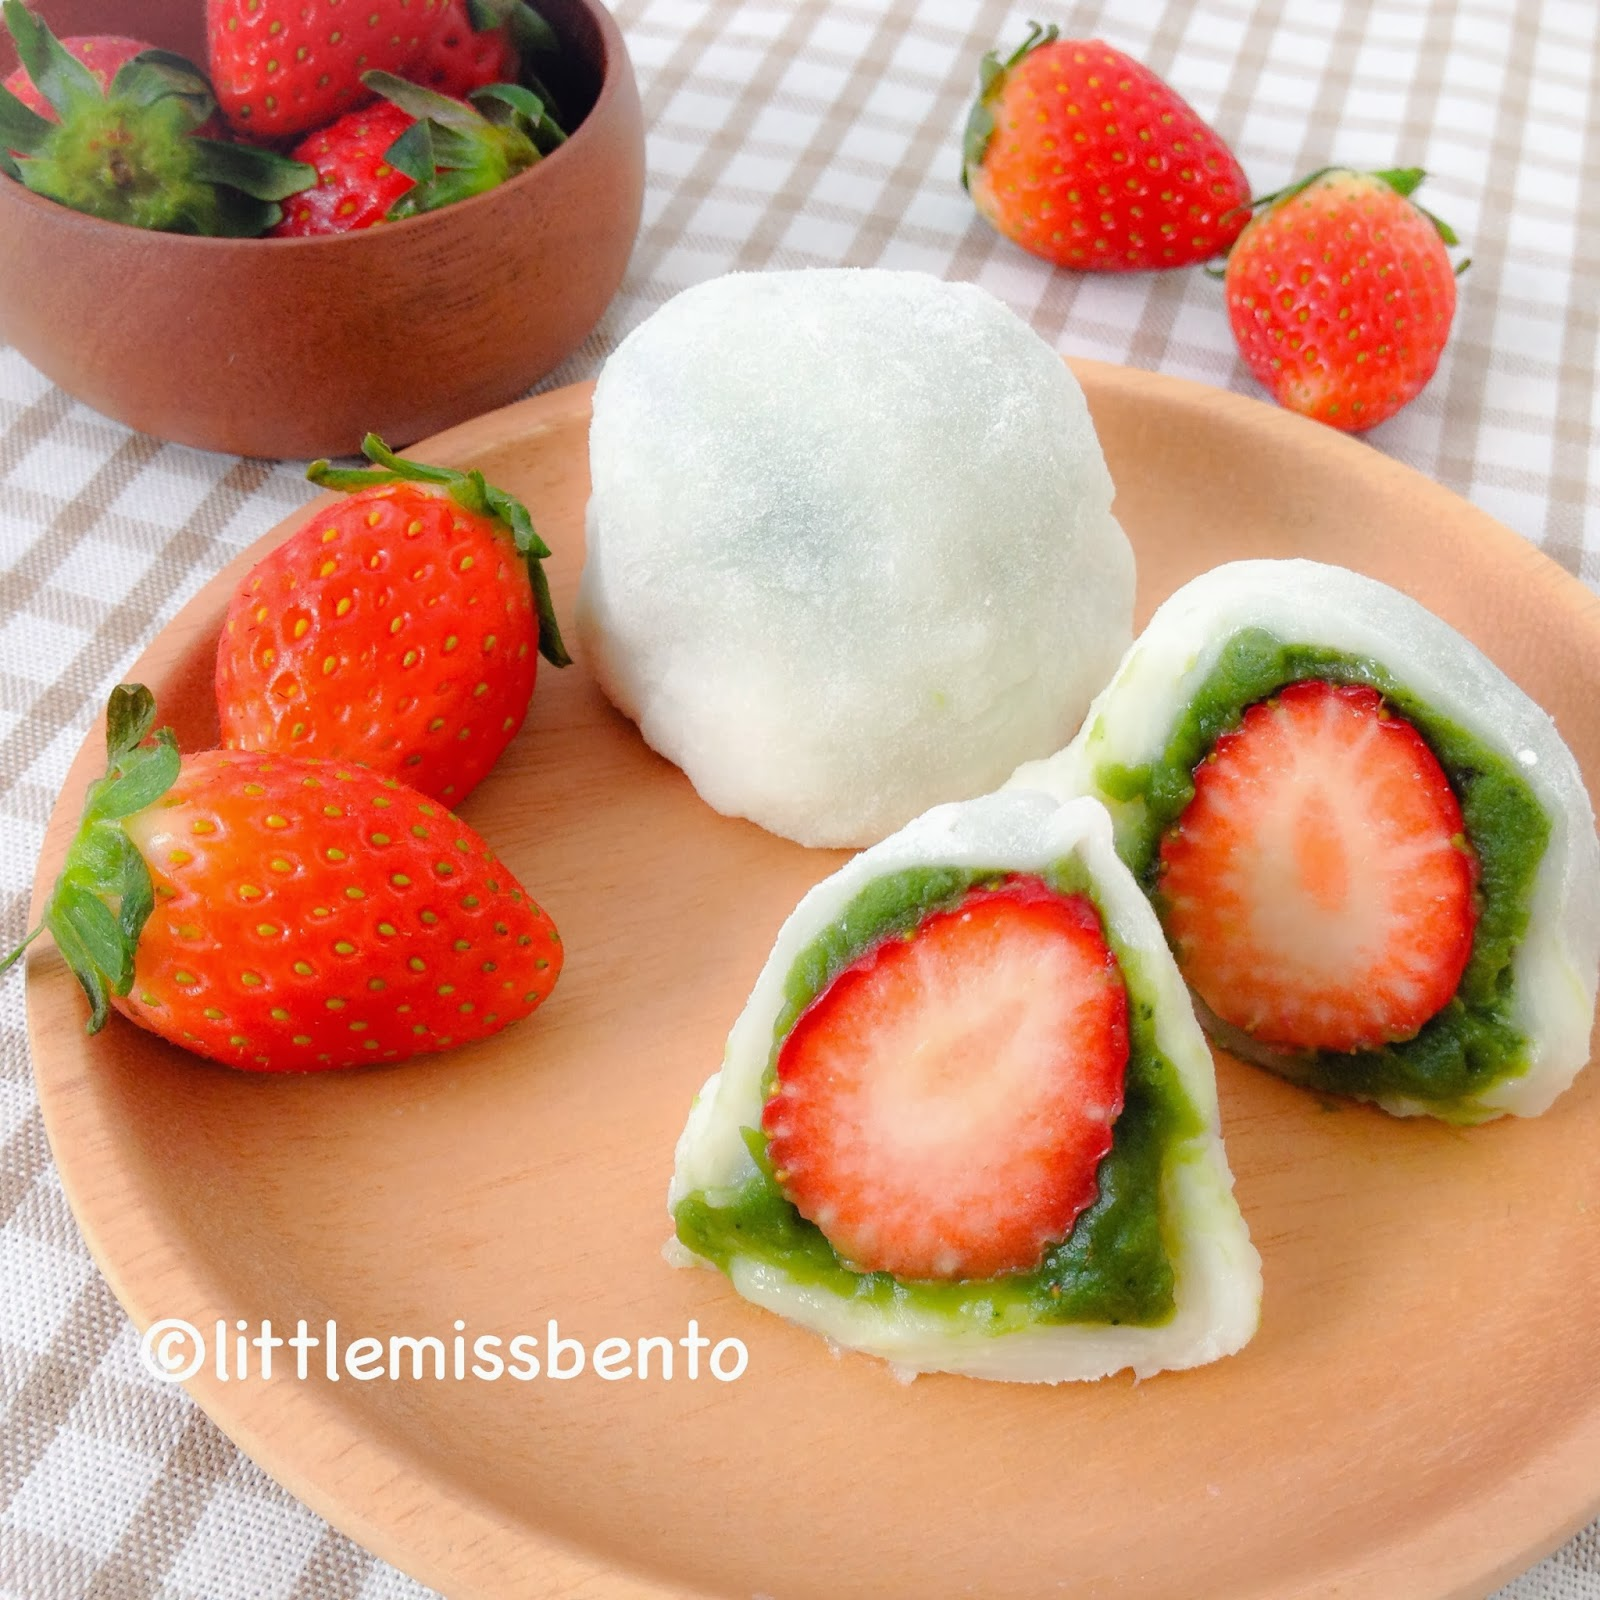 Strawberry Daifuku is a well known popular Japanese mochi sweet. Where ...